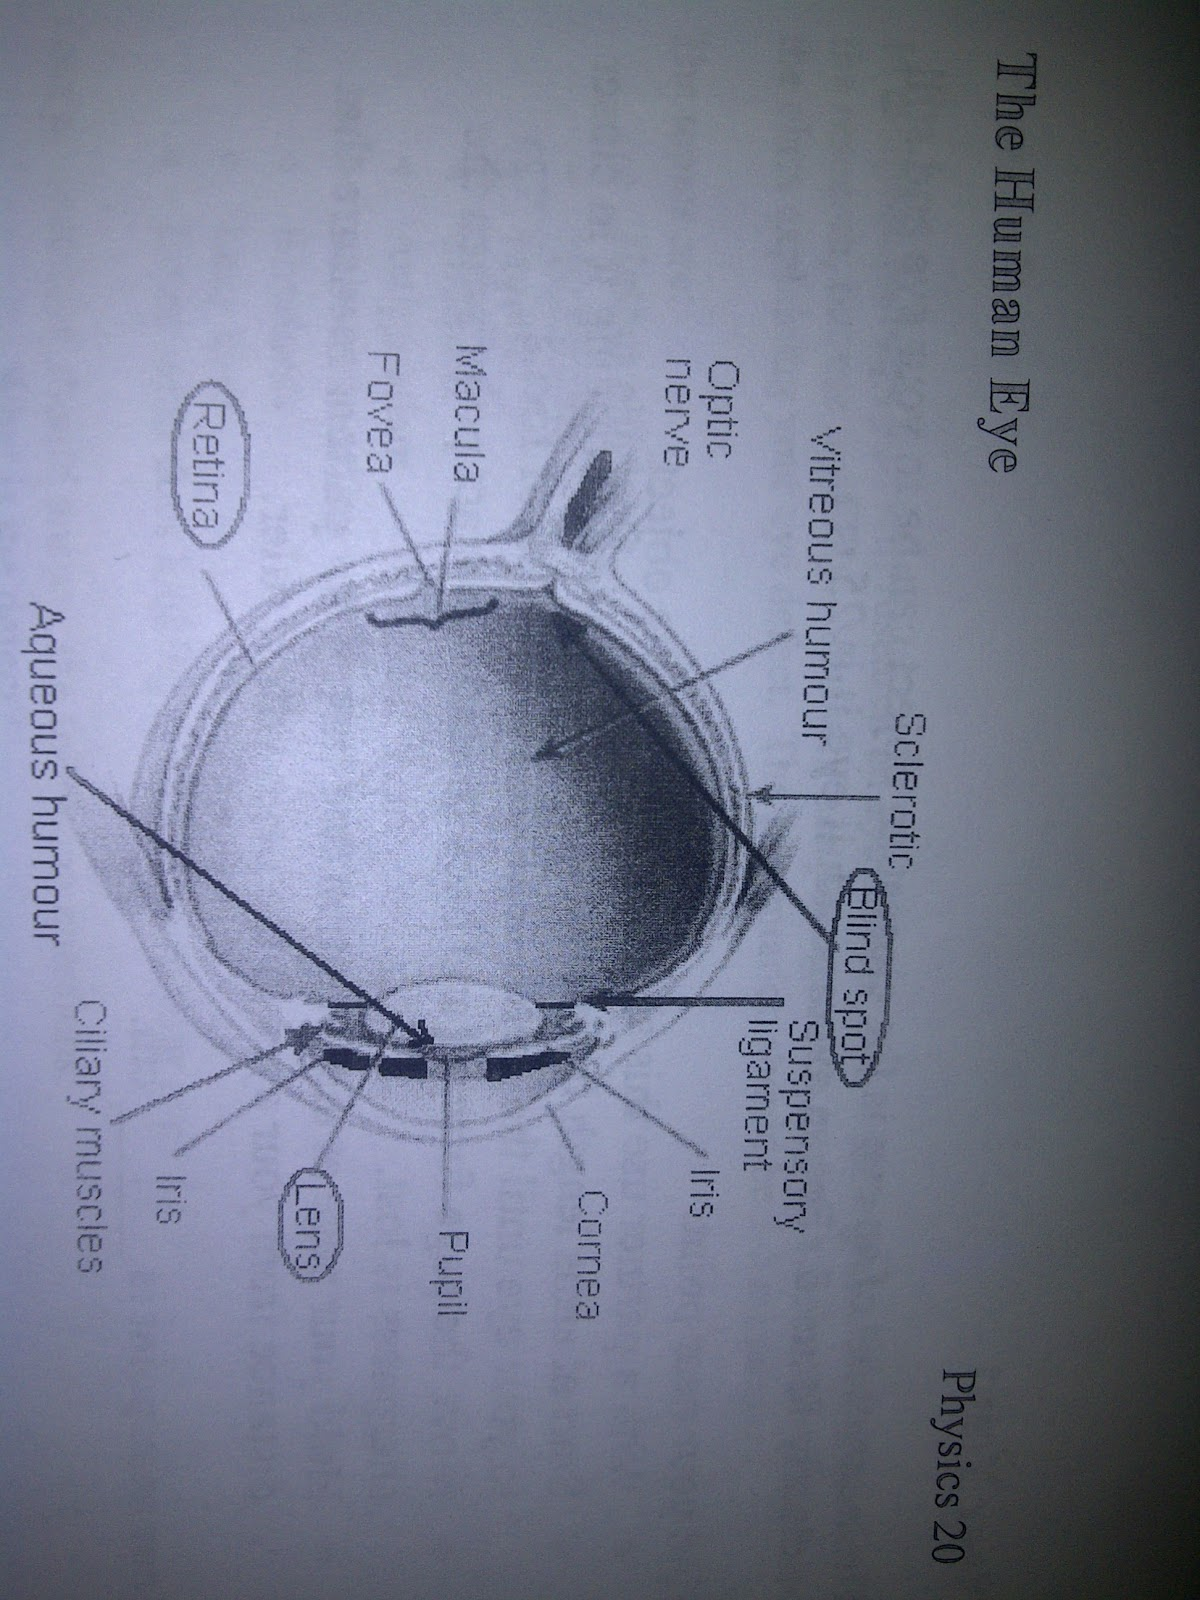 Geus lieur human eye diagram human eye diagram ccuart Gallery